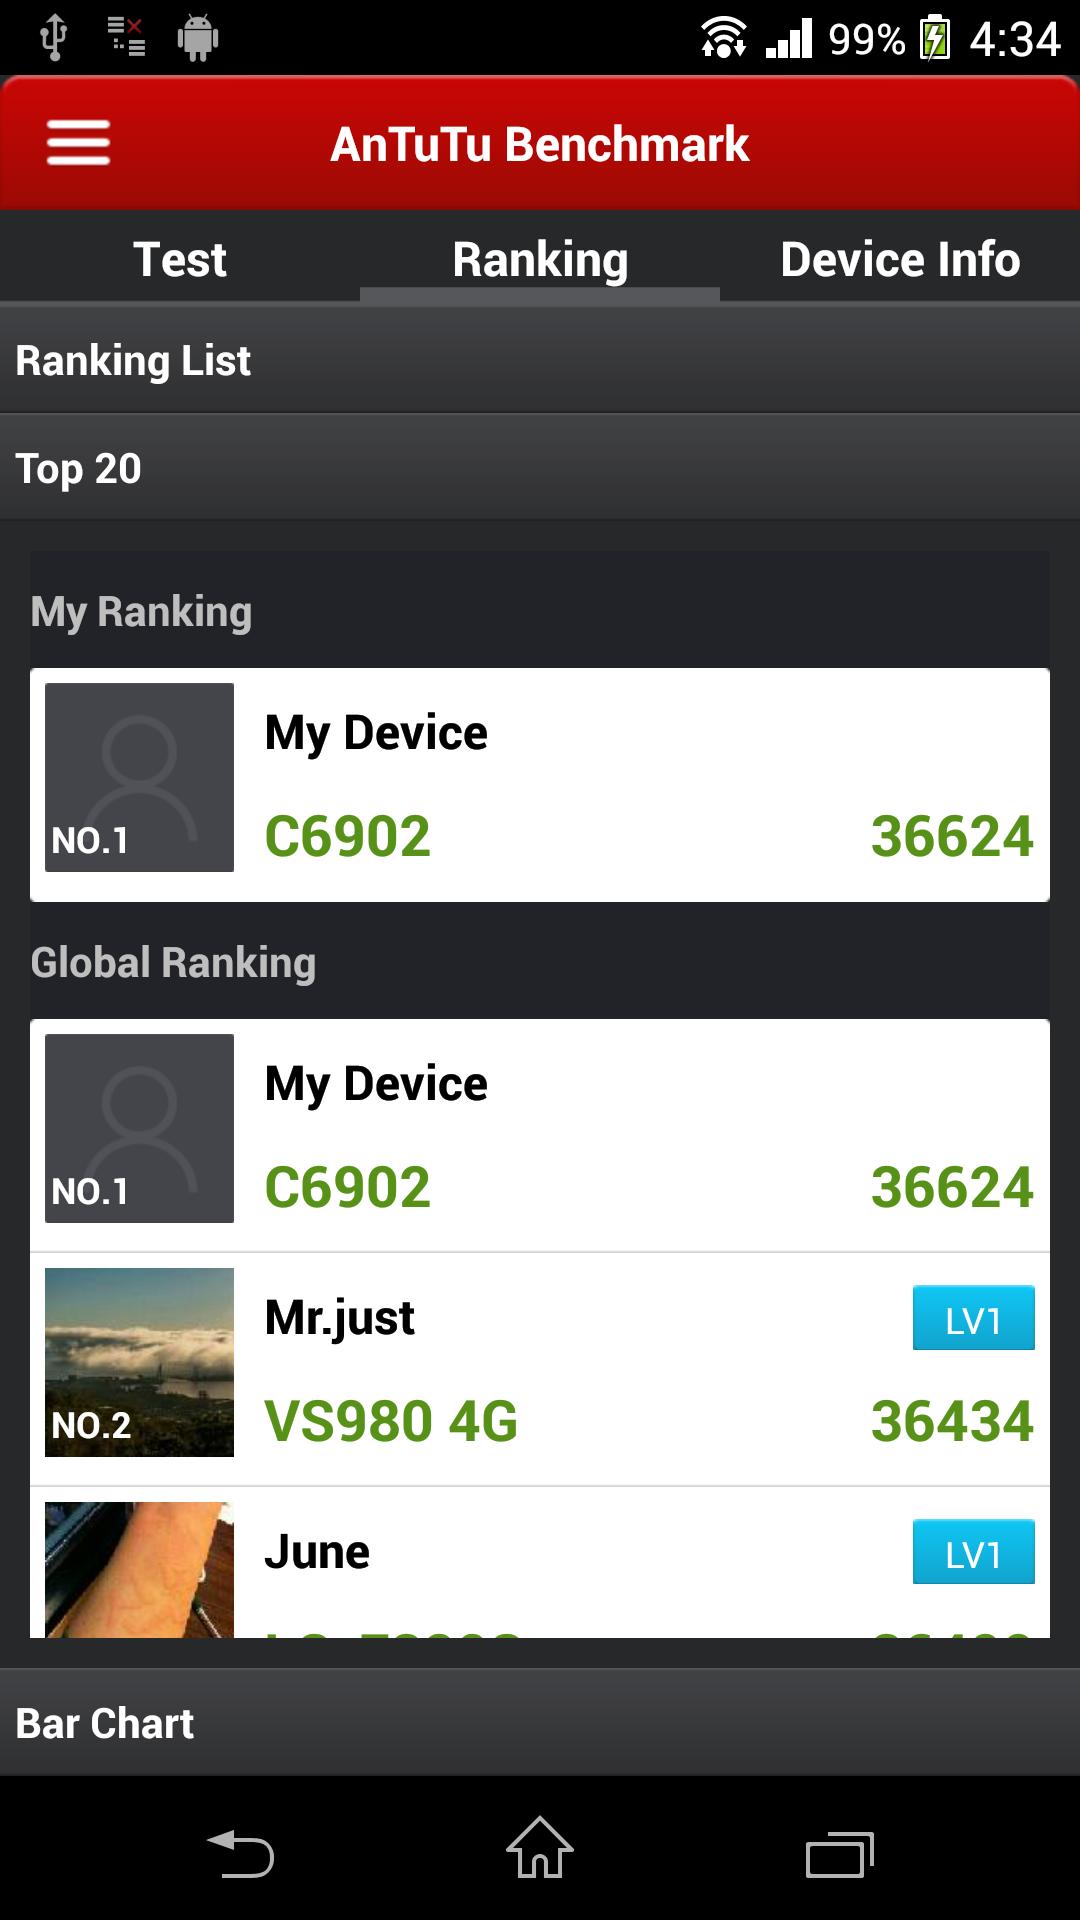 Xperia Z1 scores 36624 in AnTuTu Benchmark